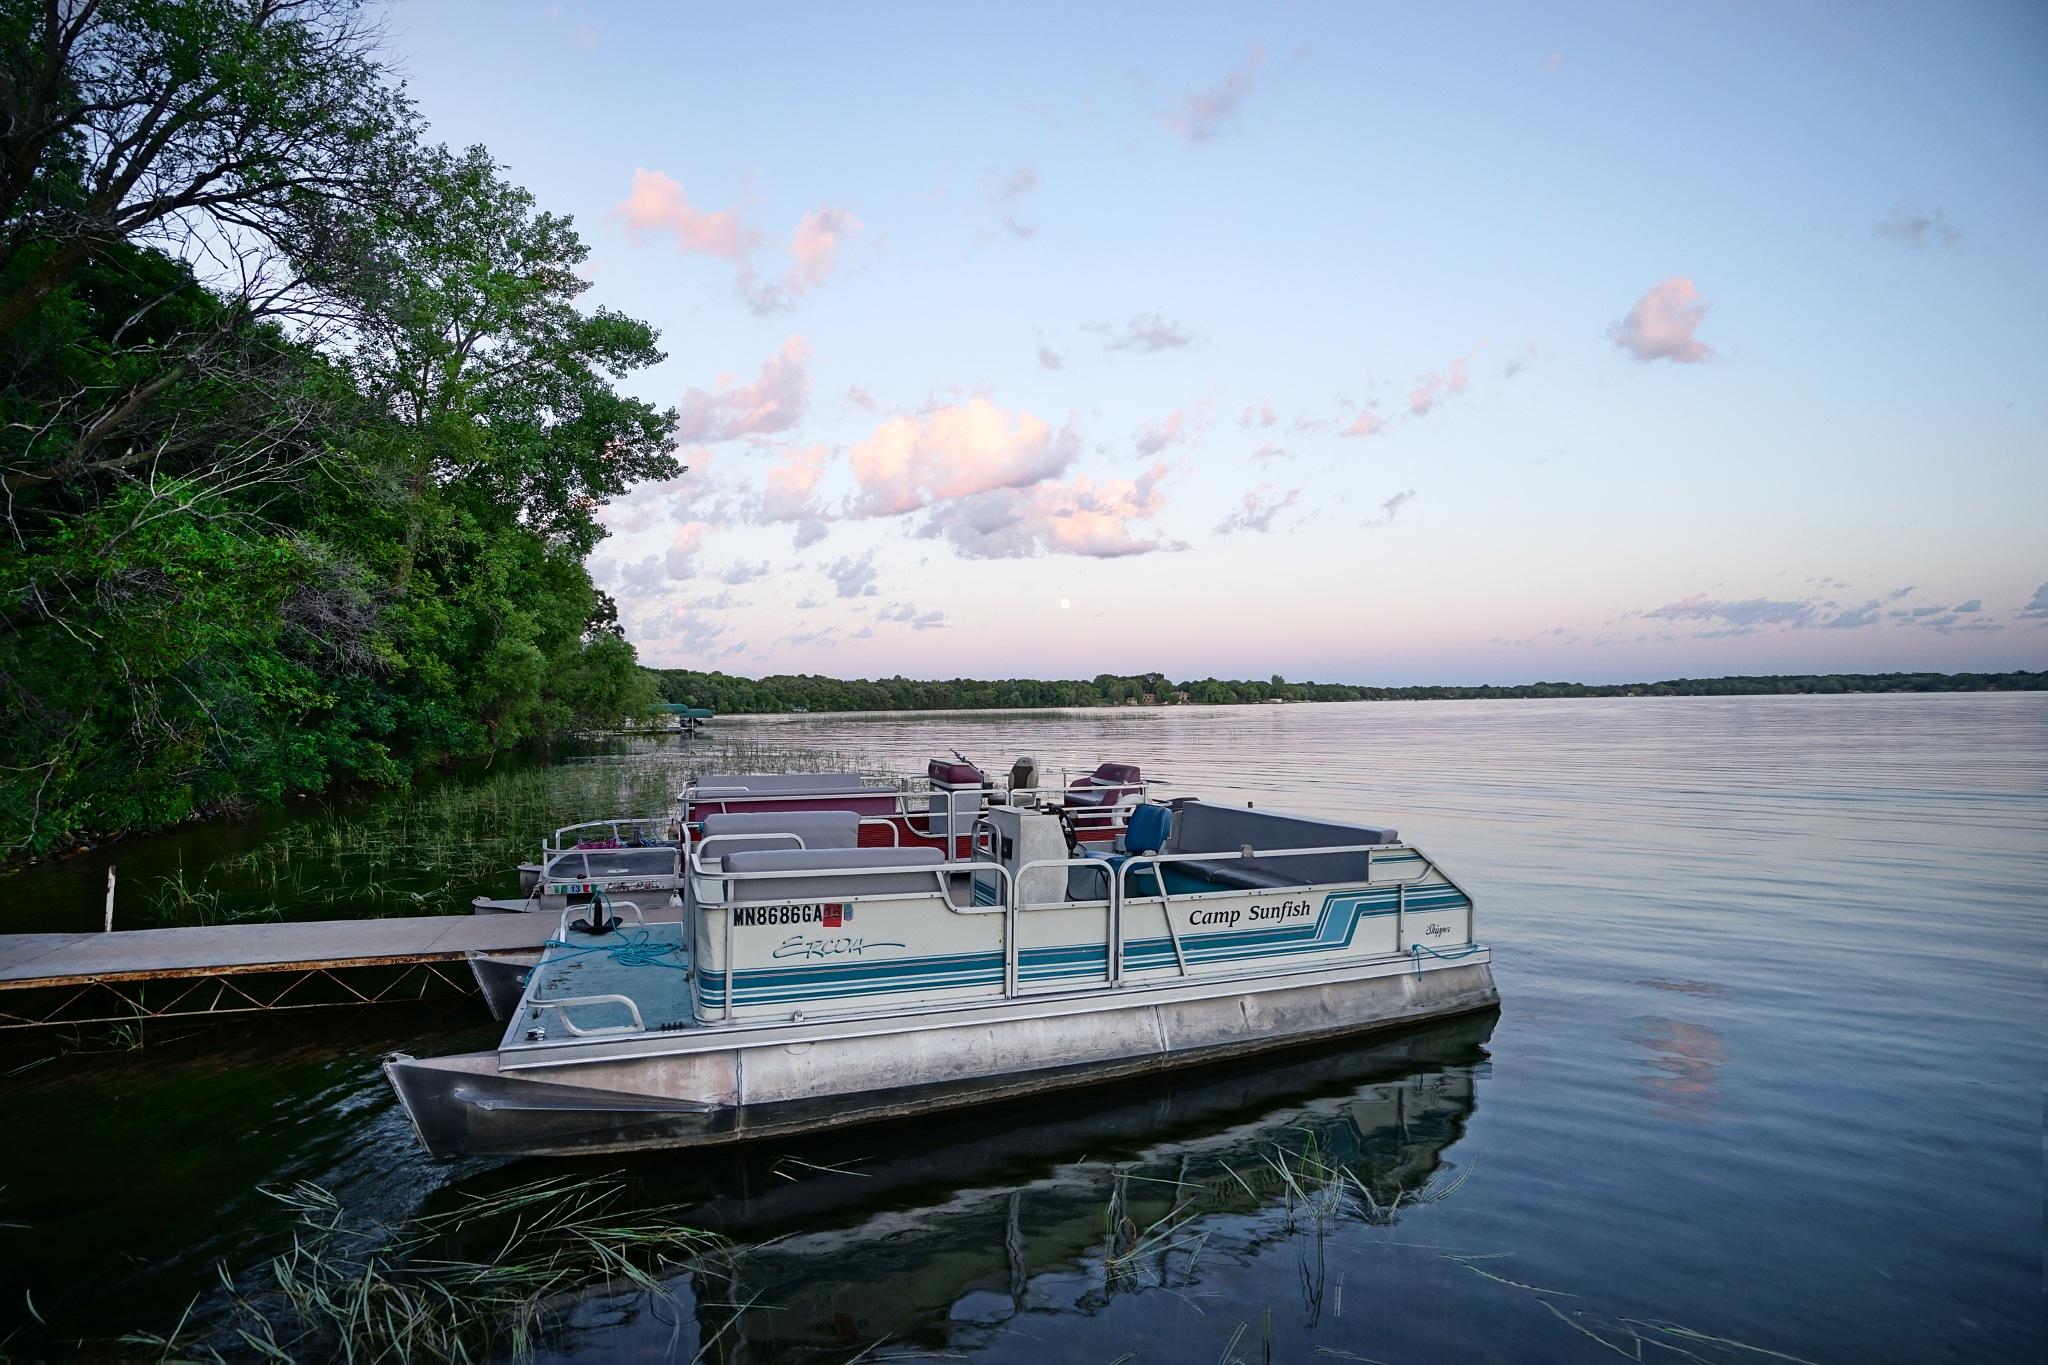 Boating Anyone? by John H. Lee